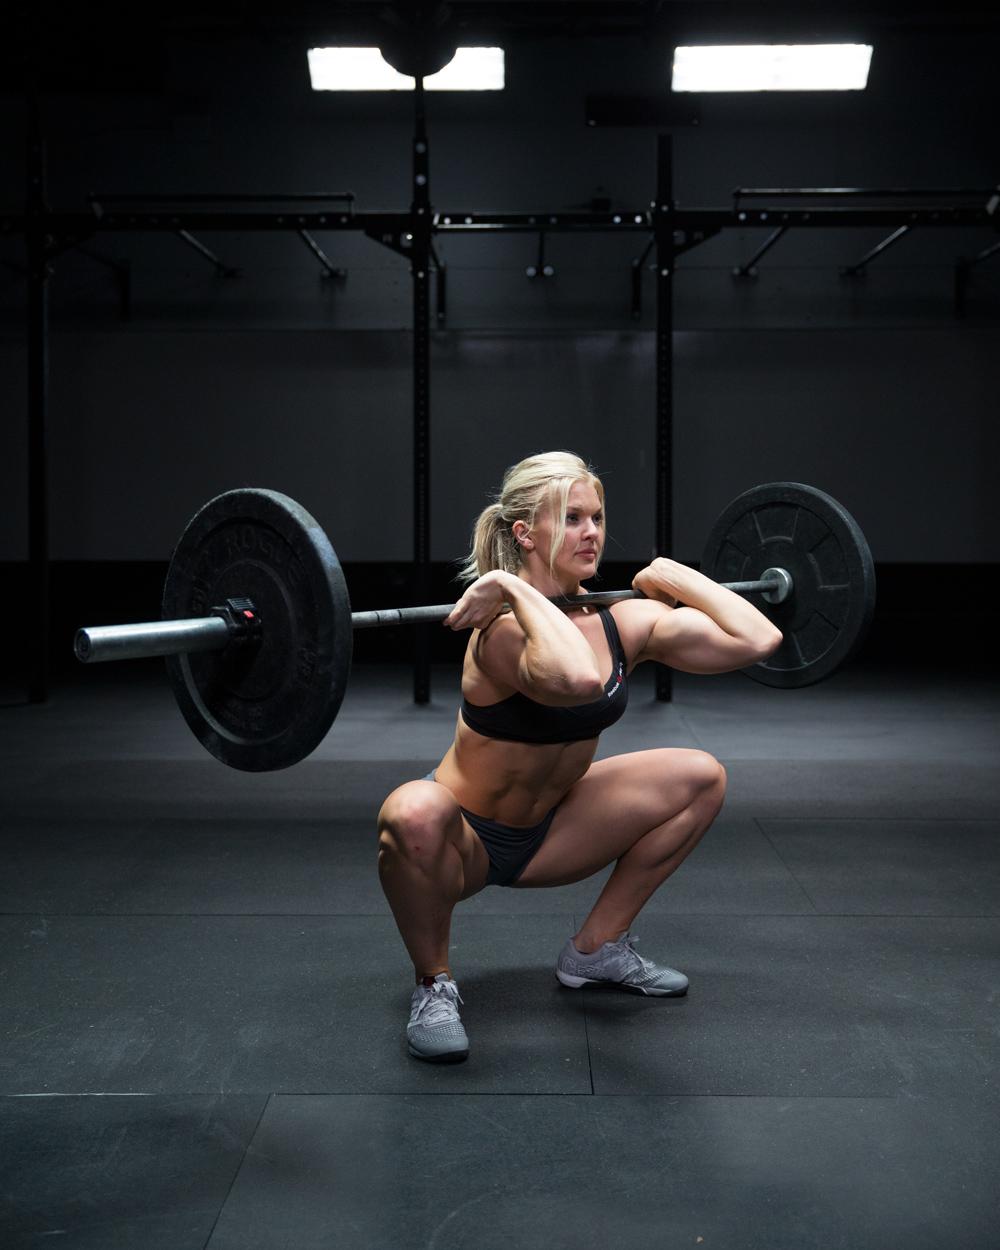 girls crossfit Front squat